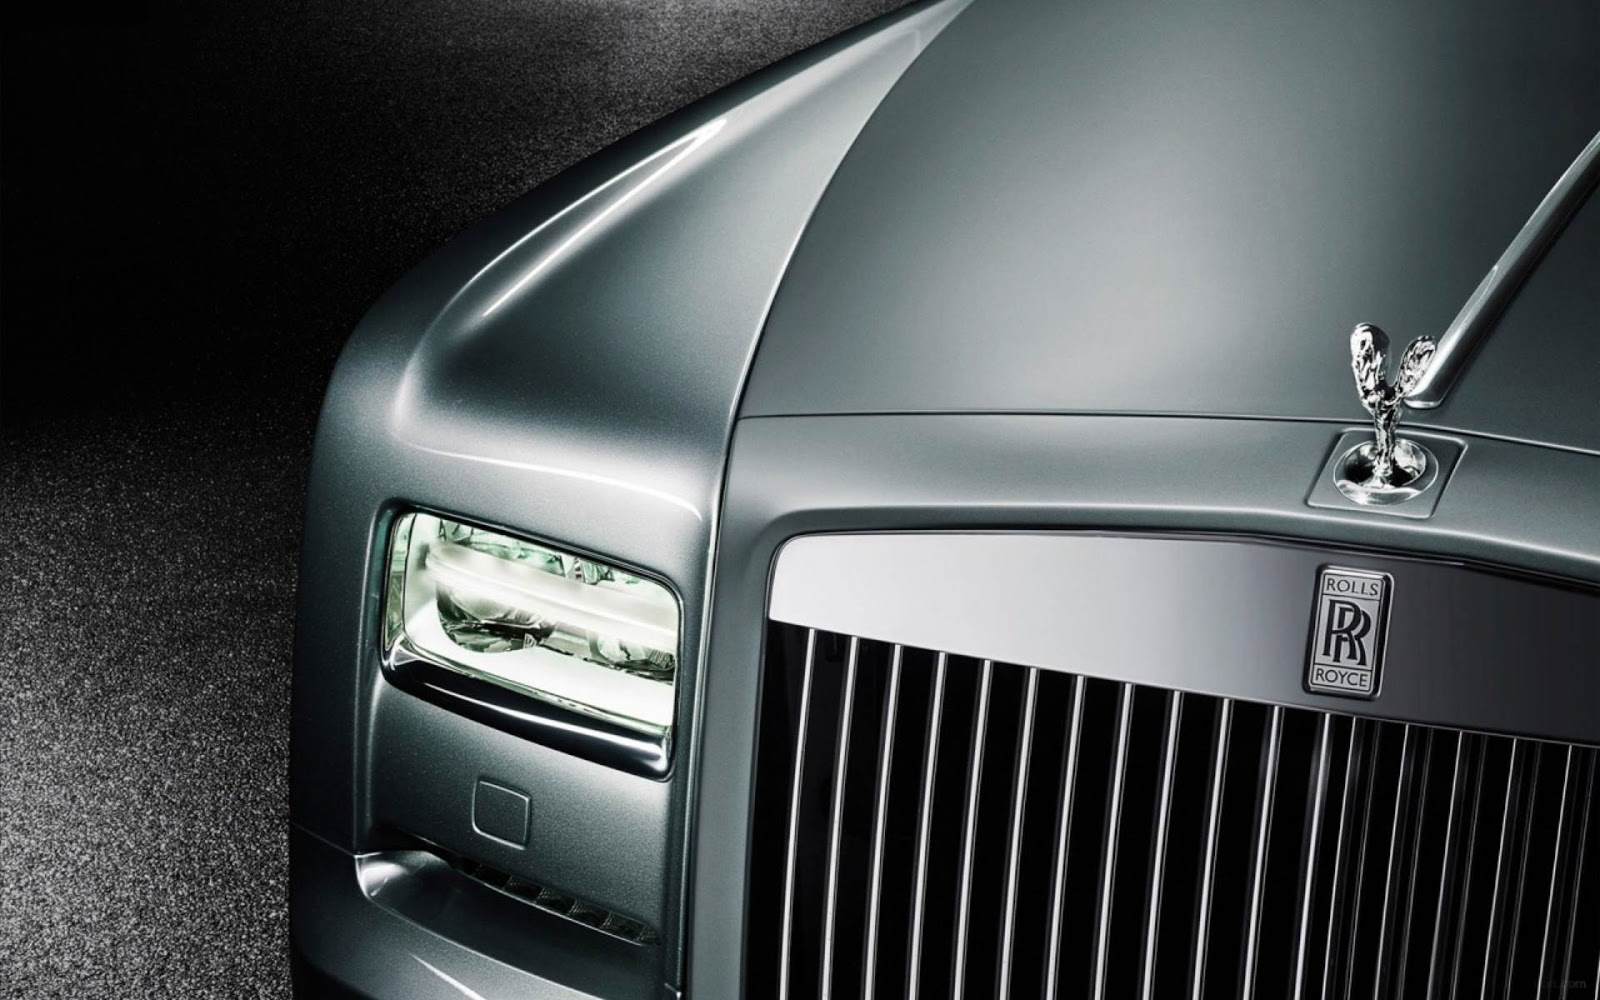 Rolls Royce Phantom Wallpaper: http://maghd.blogspot.com/2012/09/rolls-royce-phantom.html?m=0